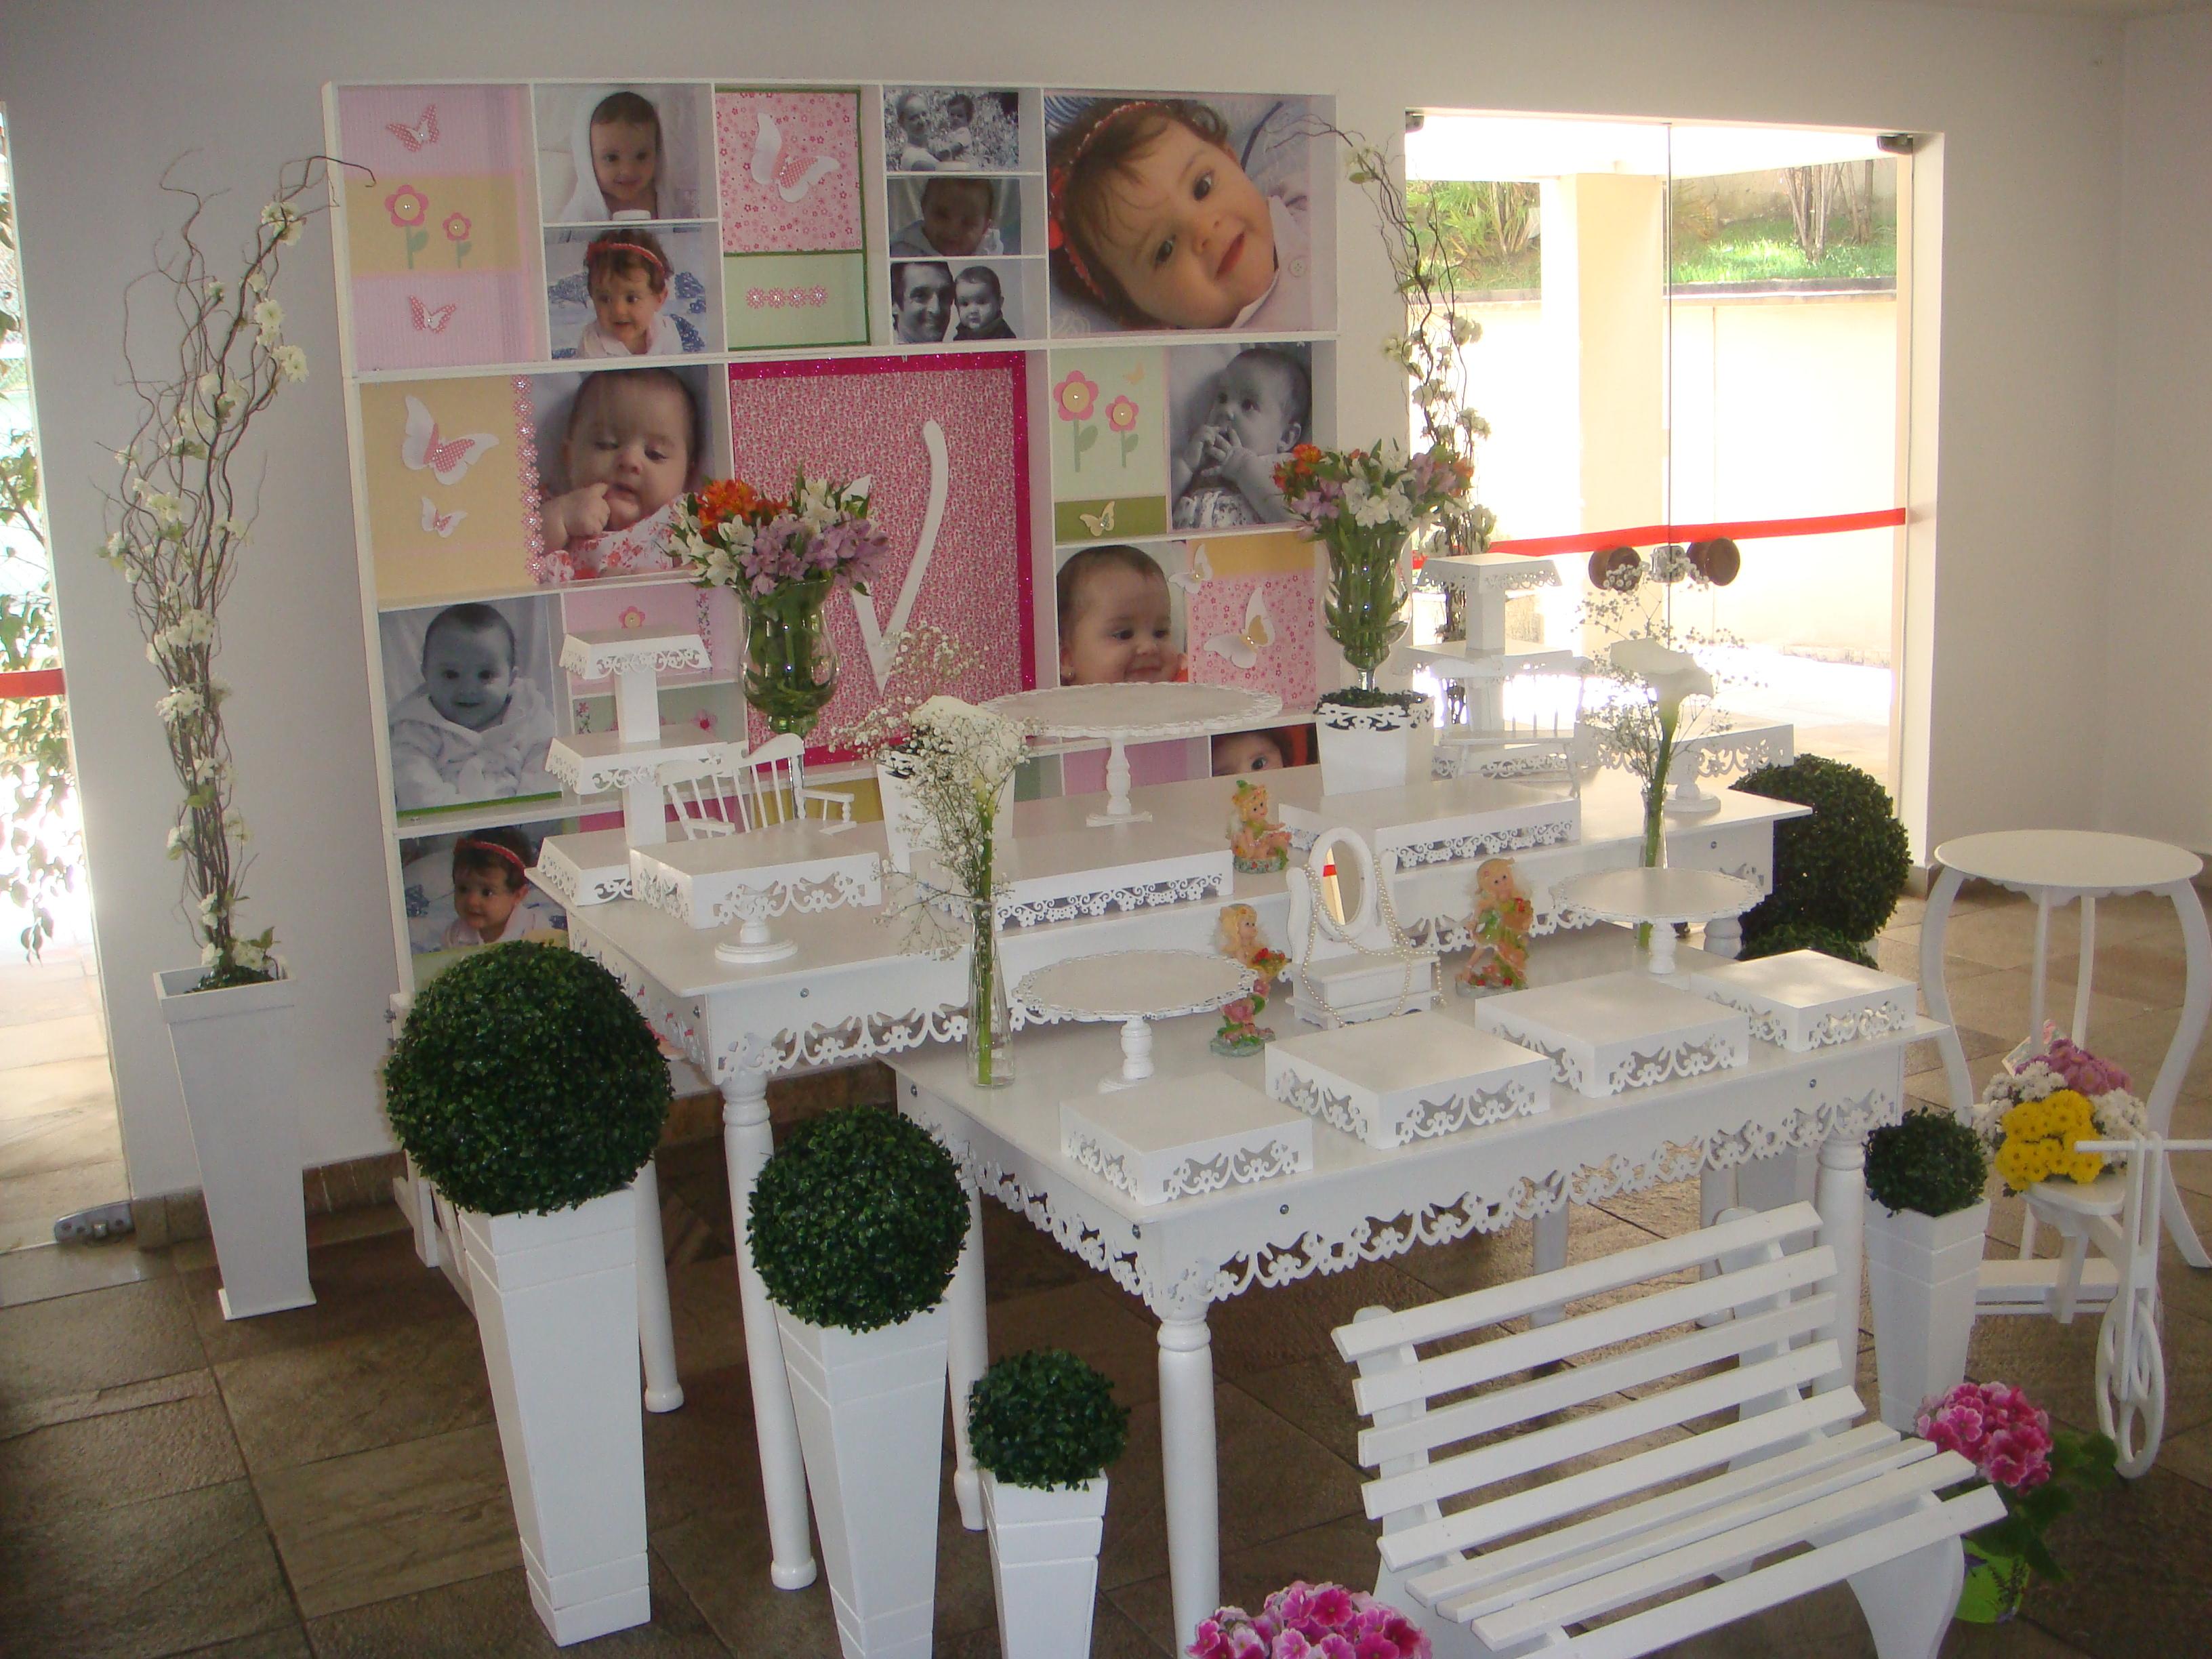 decoracao festa jardim encantado provencal:decoracao-provencal-12-jardim-encantado-decoracao-infantil